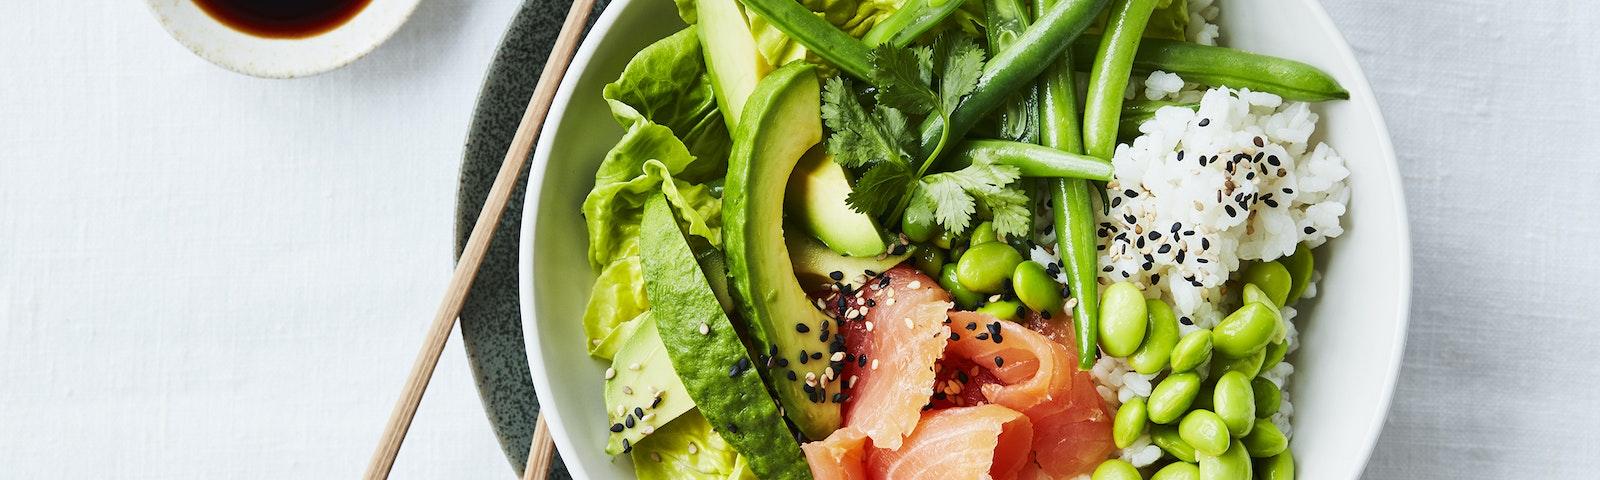 Salat sushi bowl med laks